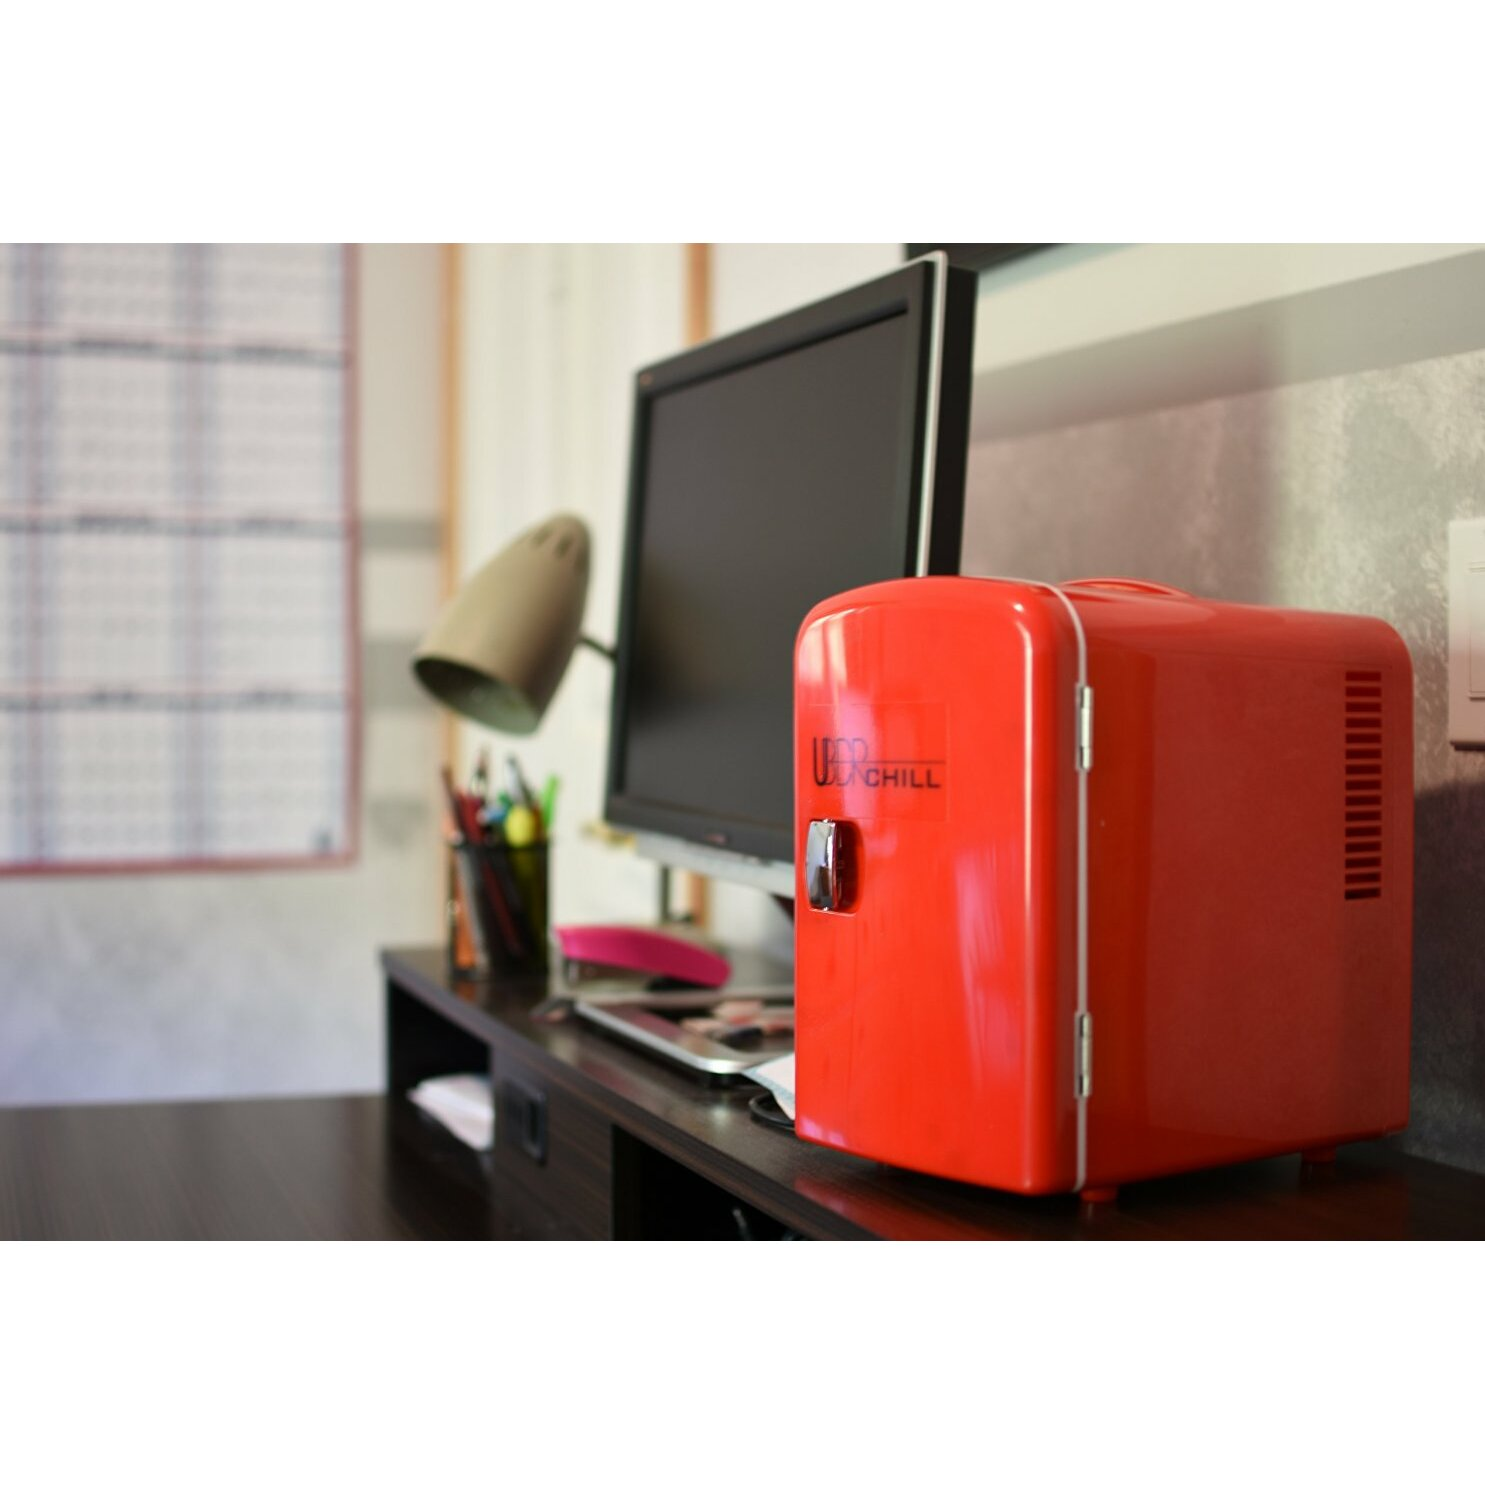 5 0 Cu Ft Mini Fridge: Uber Appliance 0.14 Cu. Ft. Compact Refrigerator & Reviews